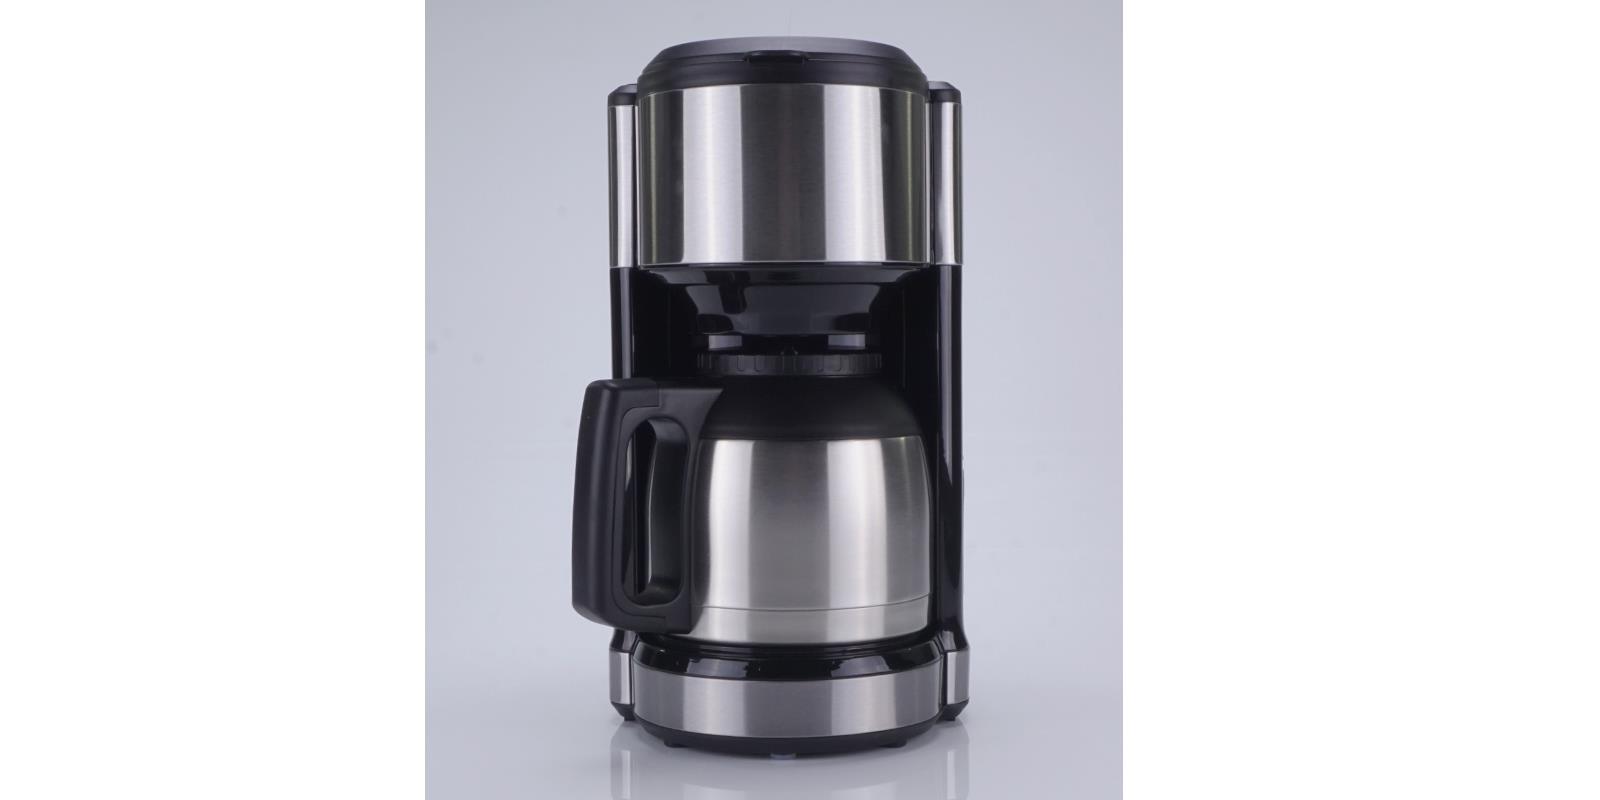 kaffeemaschine design eds mit thermoskanne timer skmd 1000 a1 schwarz kaffeeaut ebay. Black Bedroom Furniture Sets. Home Design Ideas